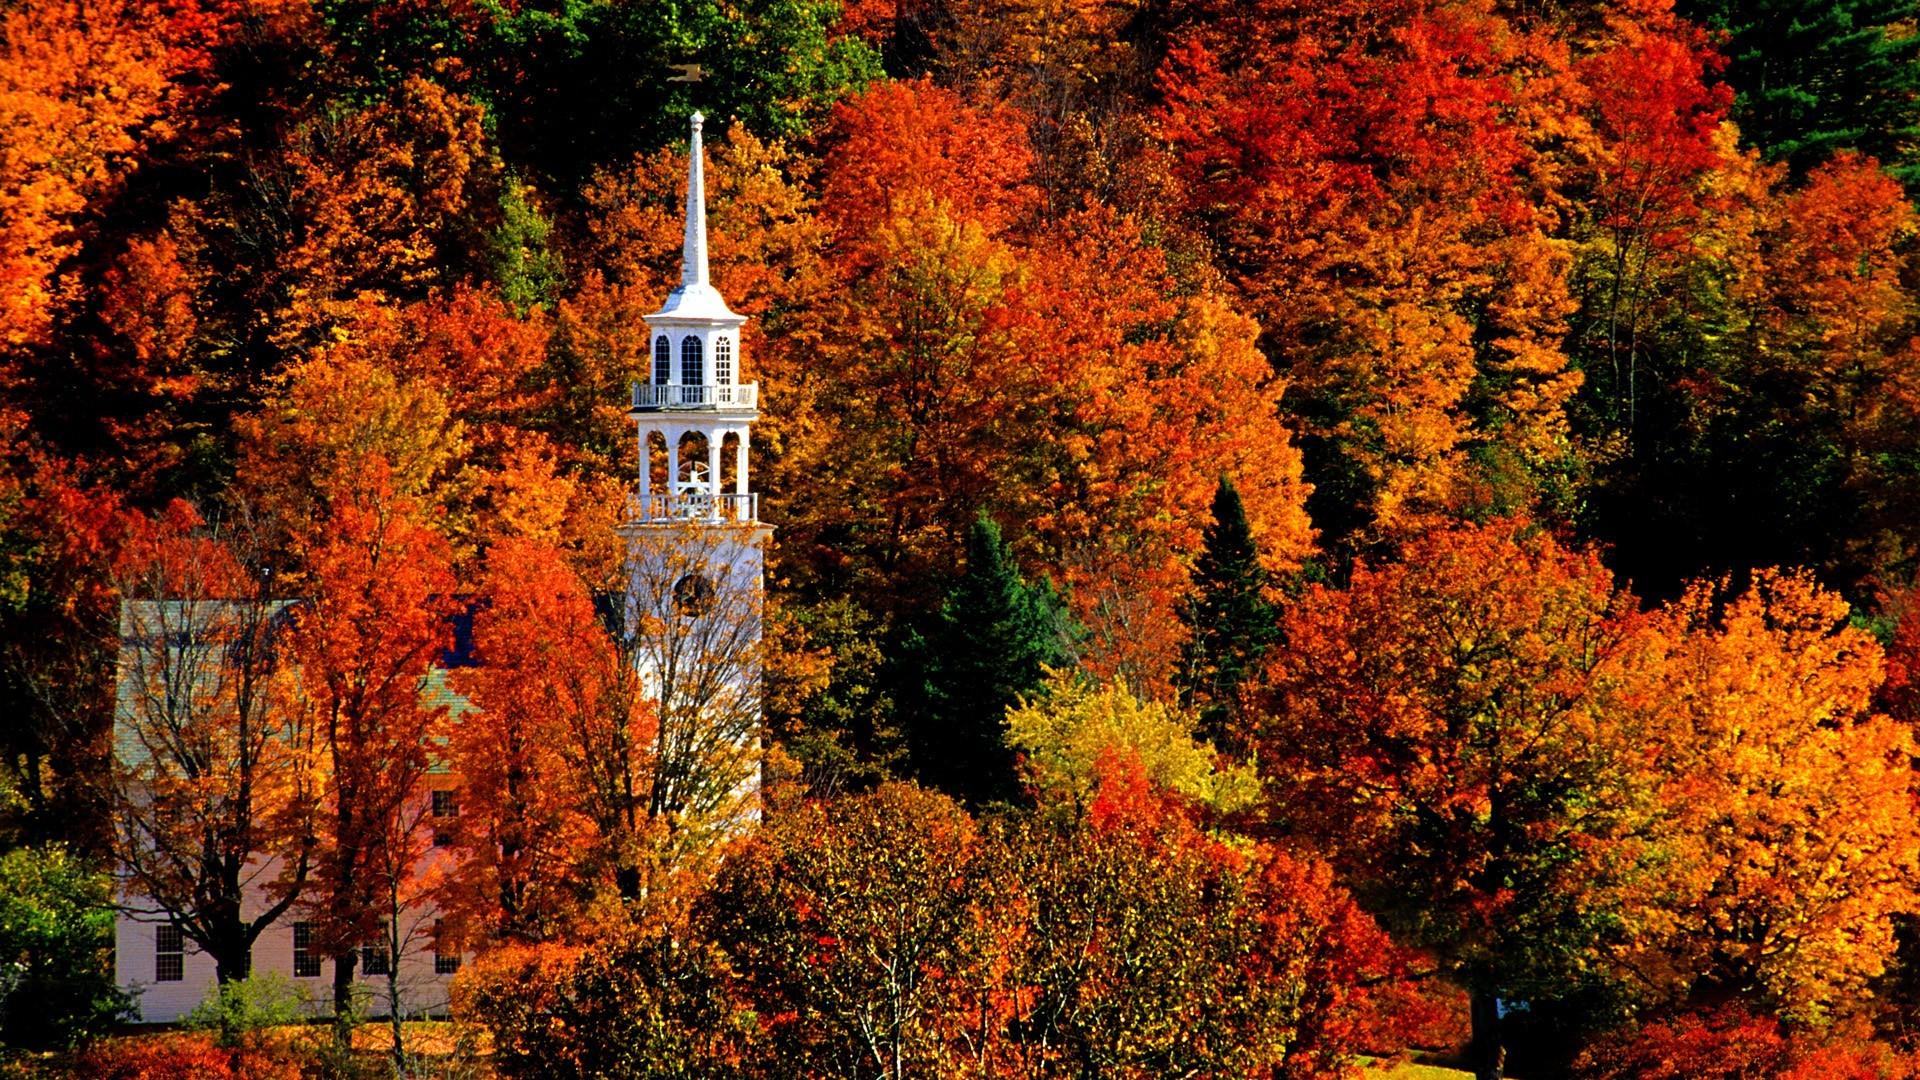 Church in Peak Fall Color, Strafford – – Full HD Wallpaper